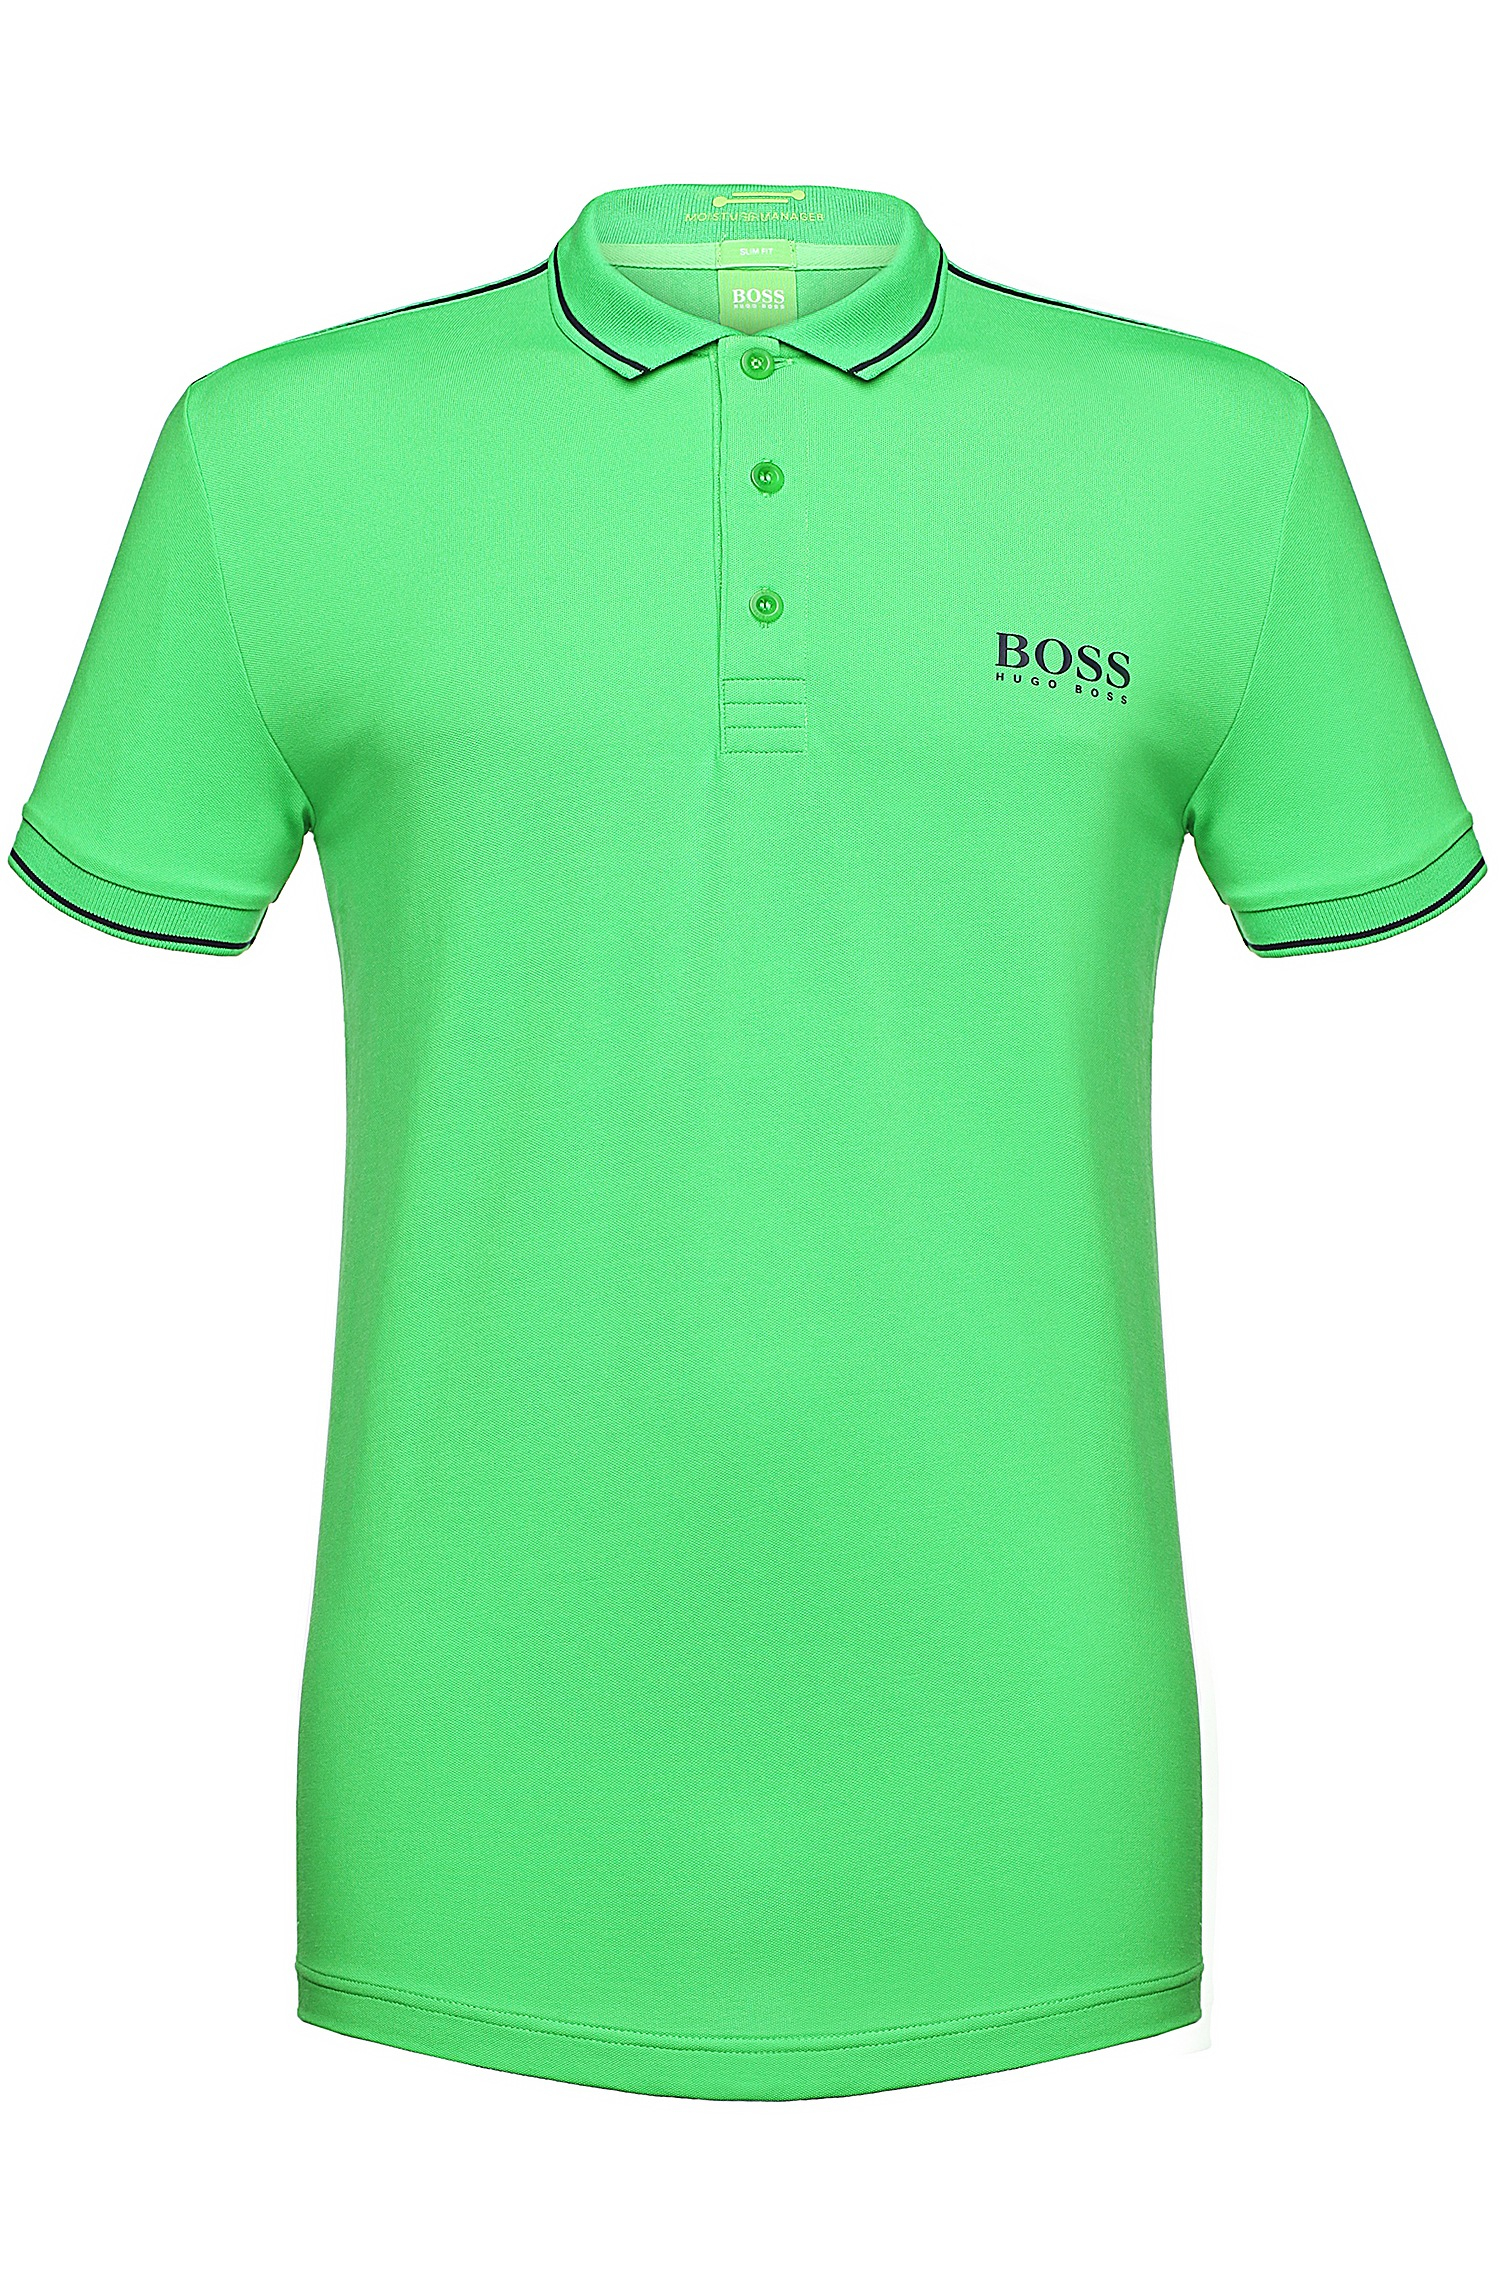 2b208119 Hugo Boss Green Paule 4 Polo Shirt | Kuenzi Turf & Nursery